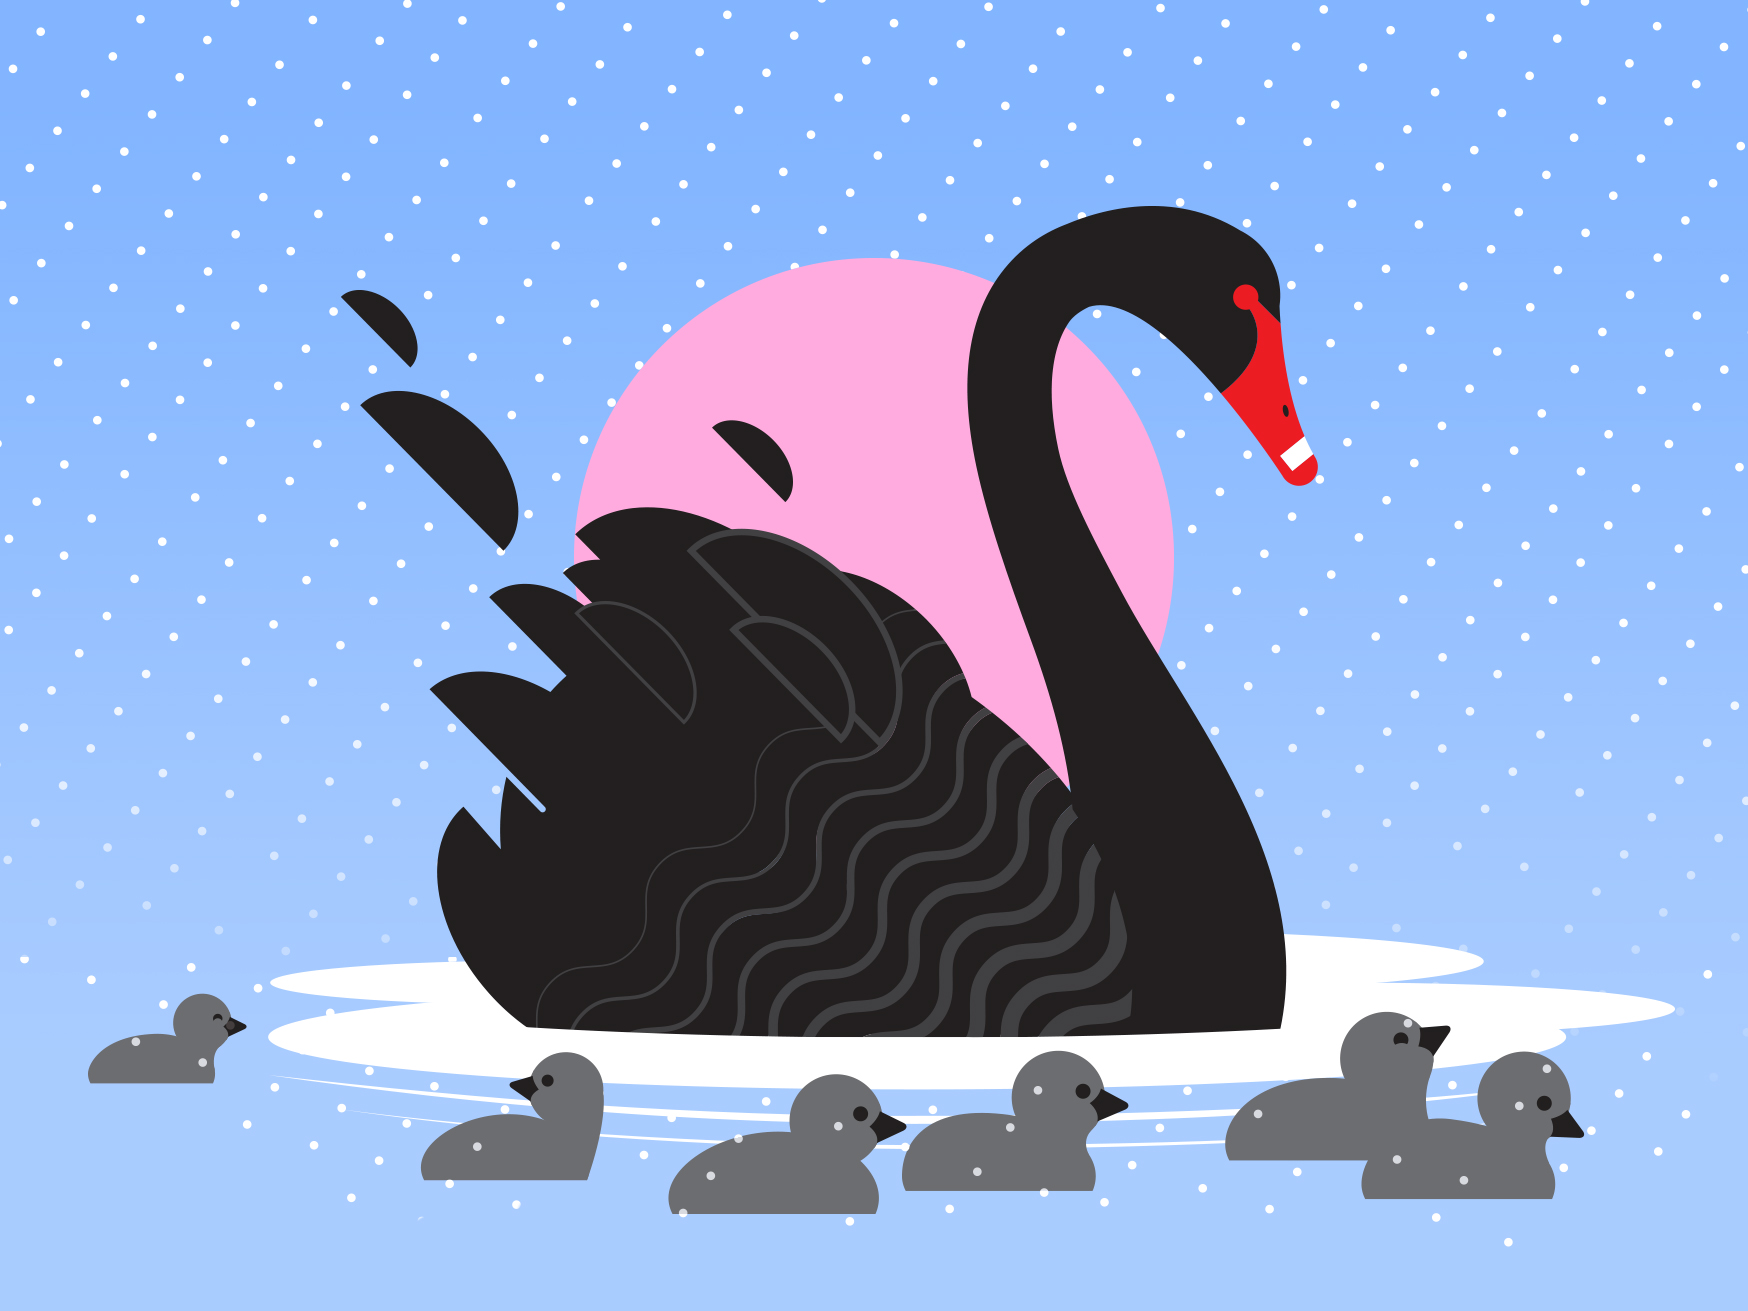 Seven swans swimming